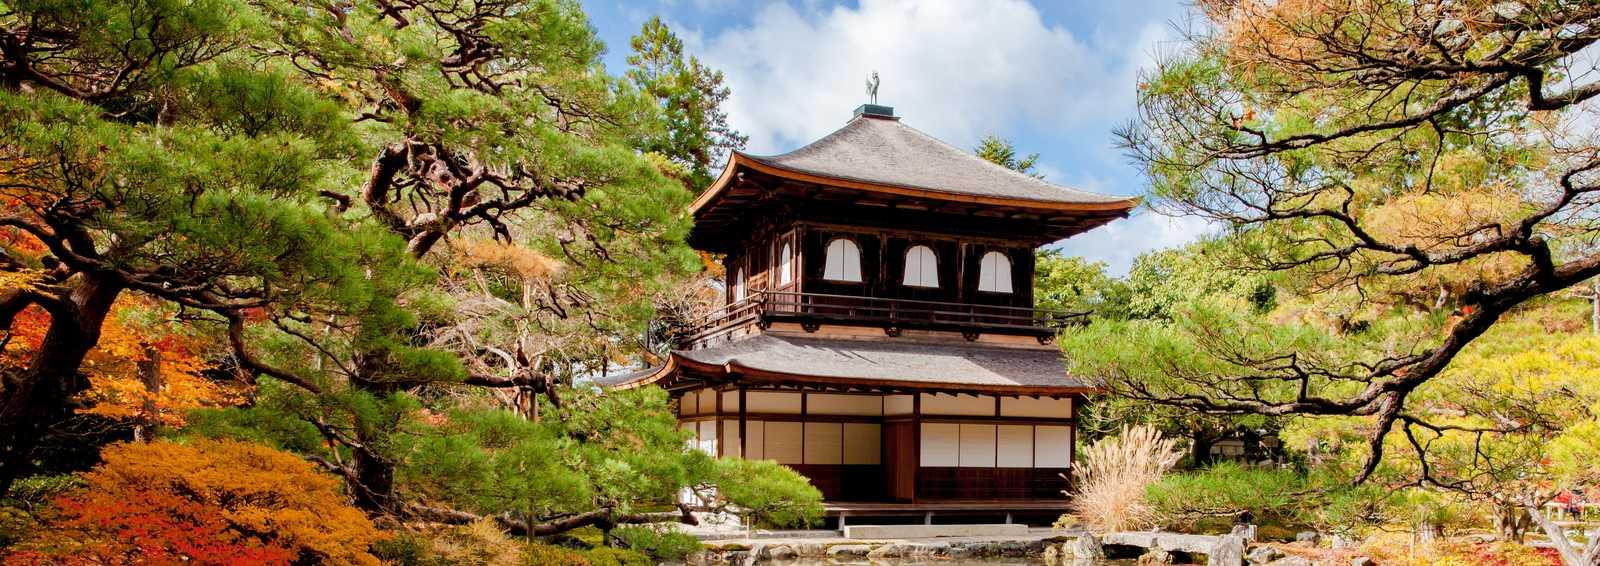 Ginkakuji temple - Kyoto, Japan